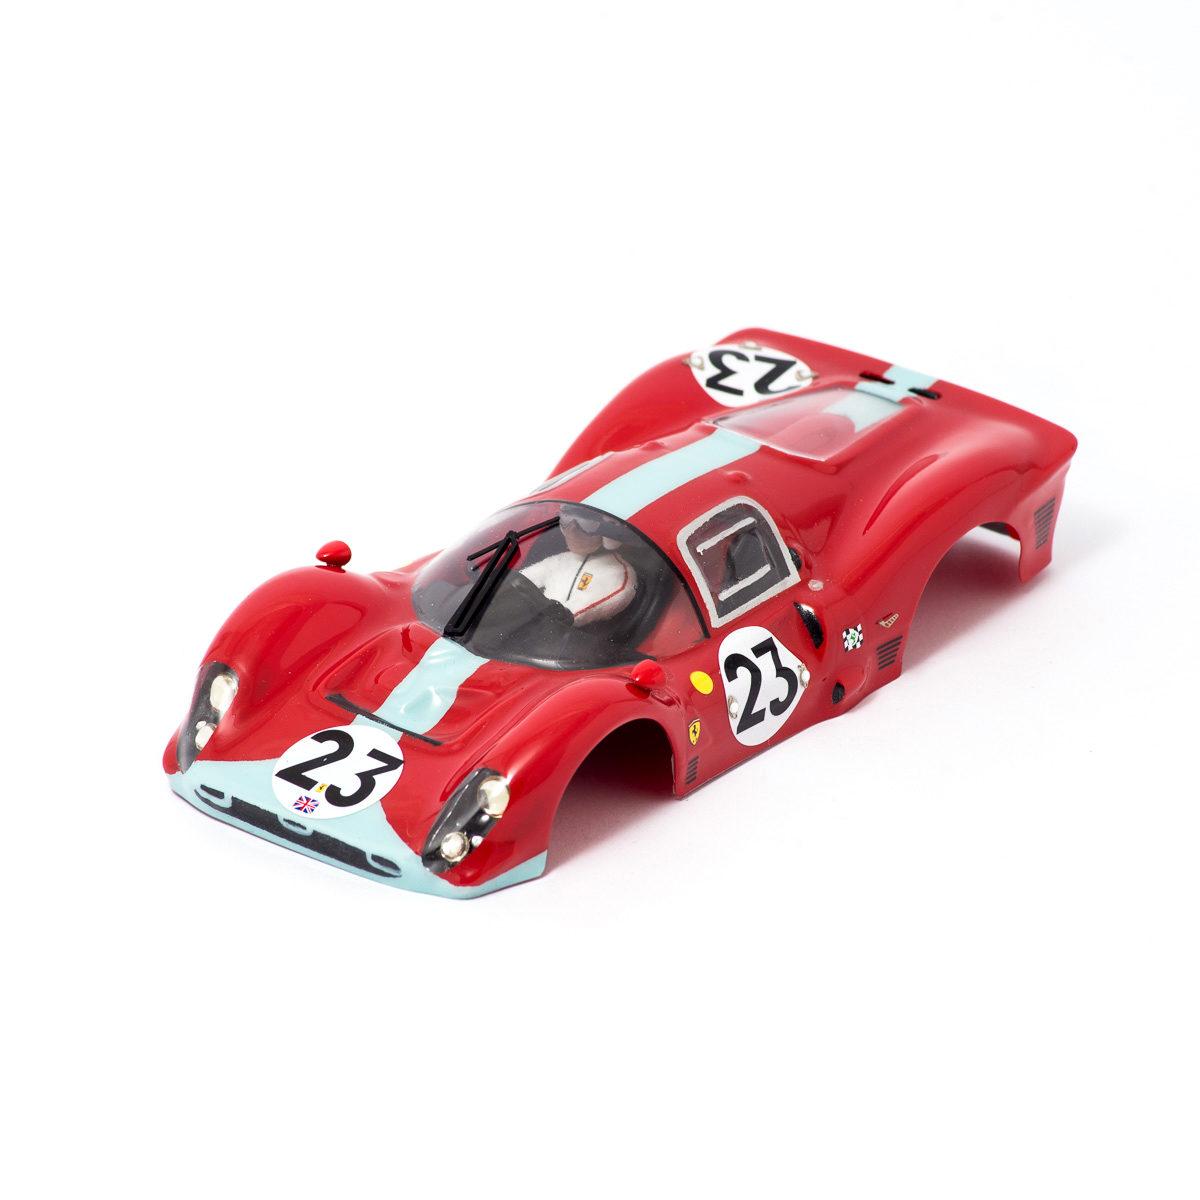 Slot Car Body Ferrari 412P 1/24 1967 Maranello Concessionaires